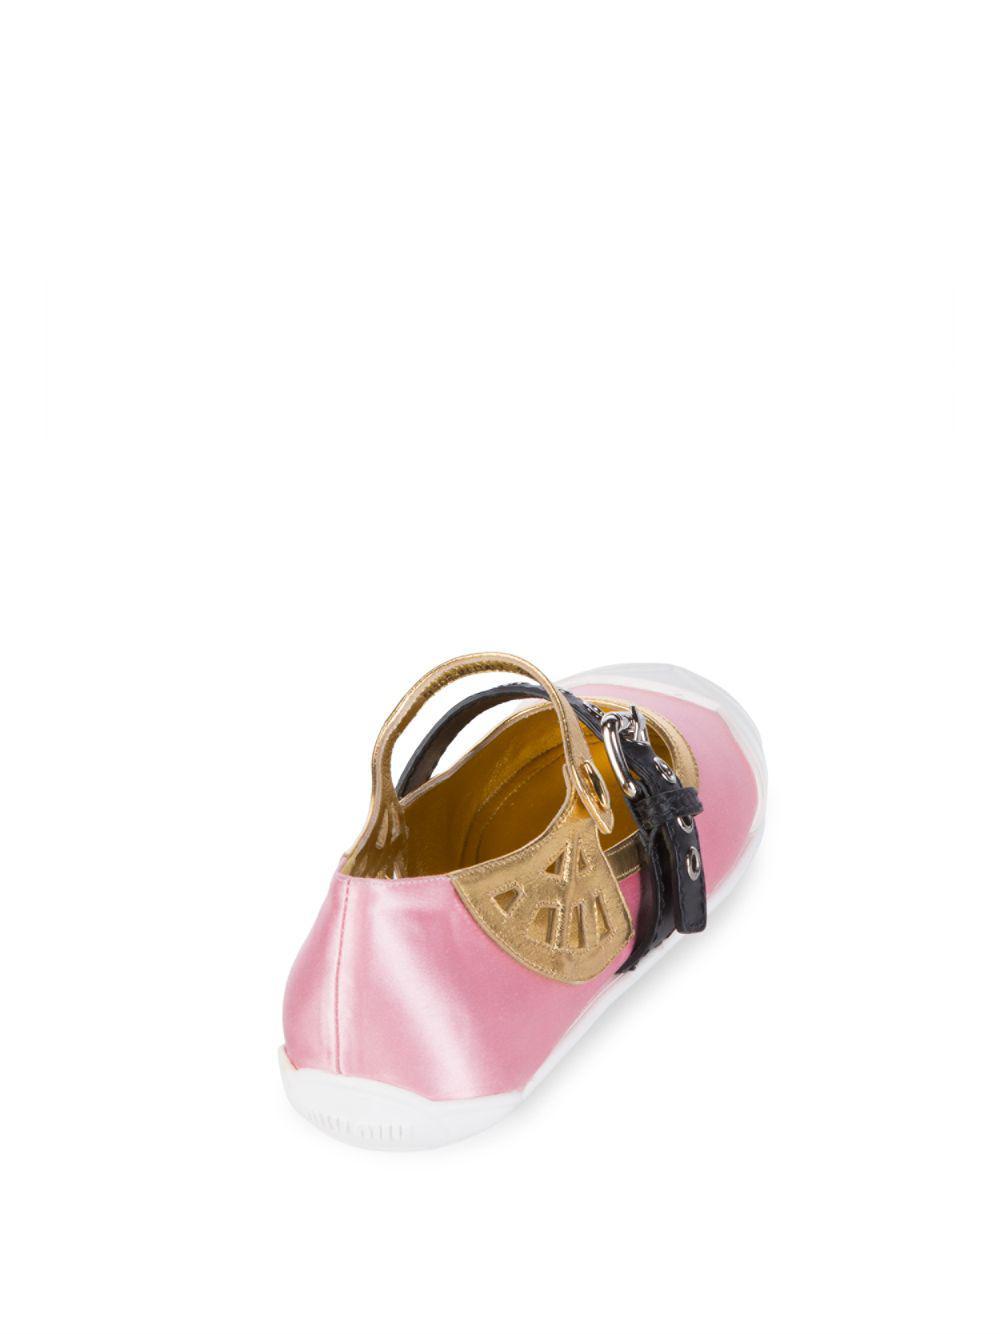 88f330e239d05 Miu Miu Buckle Ballet Flats in Pink - Save 25% - Lyst